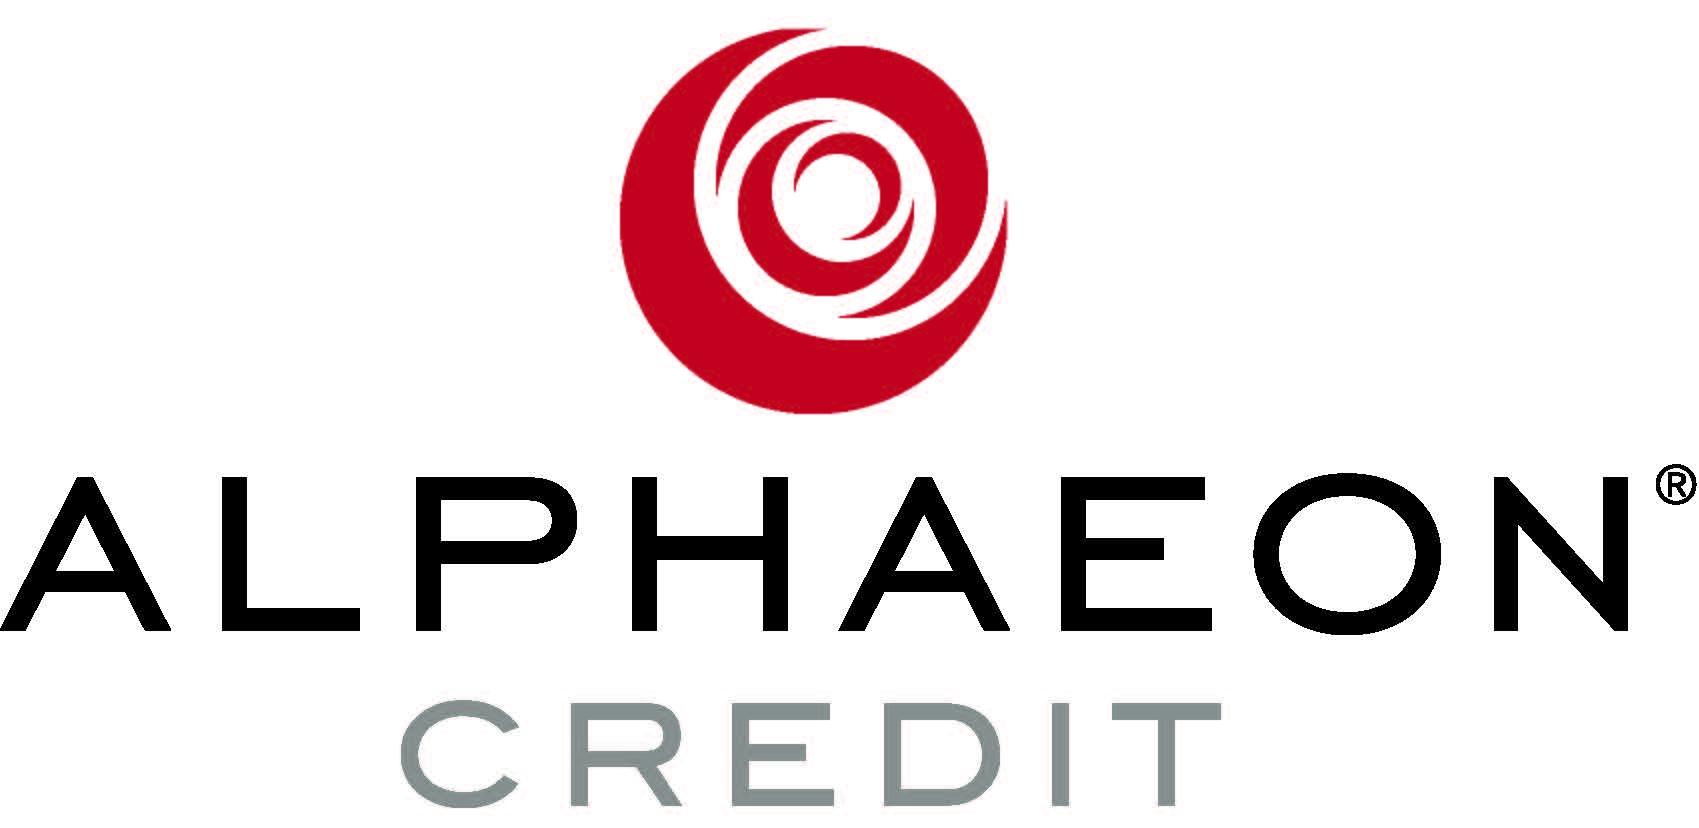 Alphaeon_Credit_logo_registered.jpg